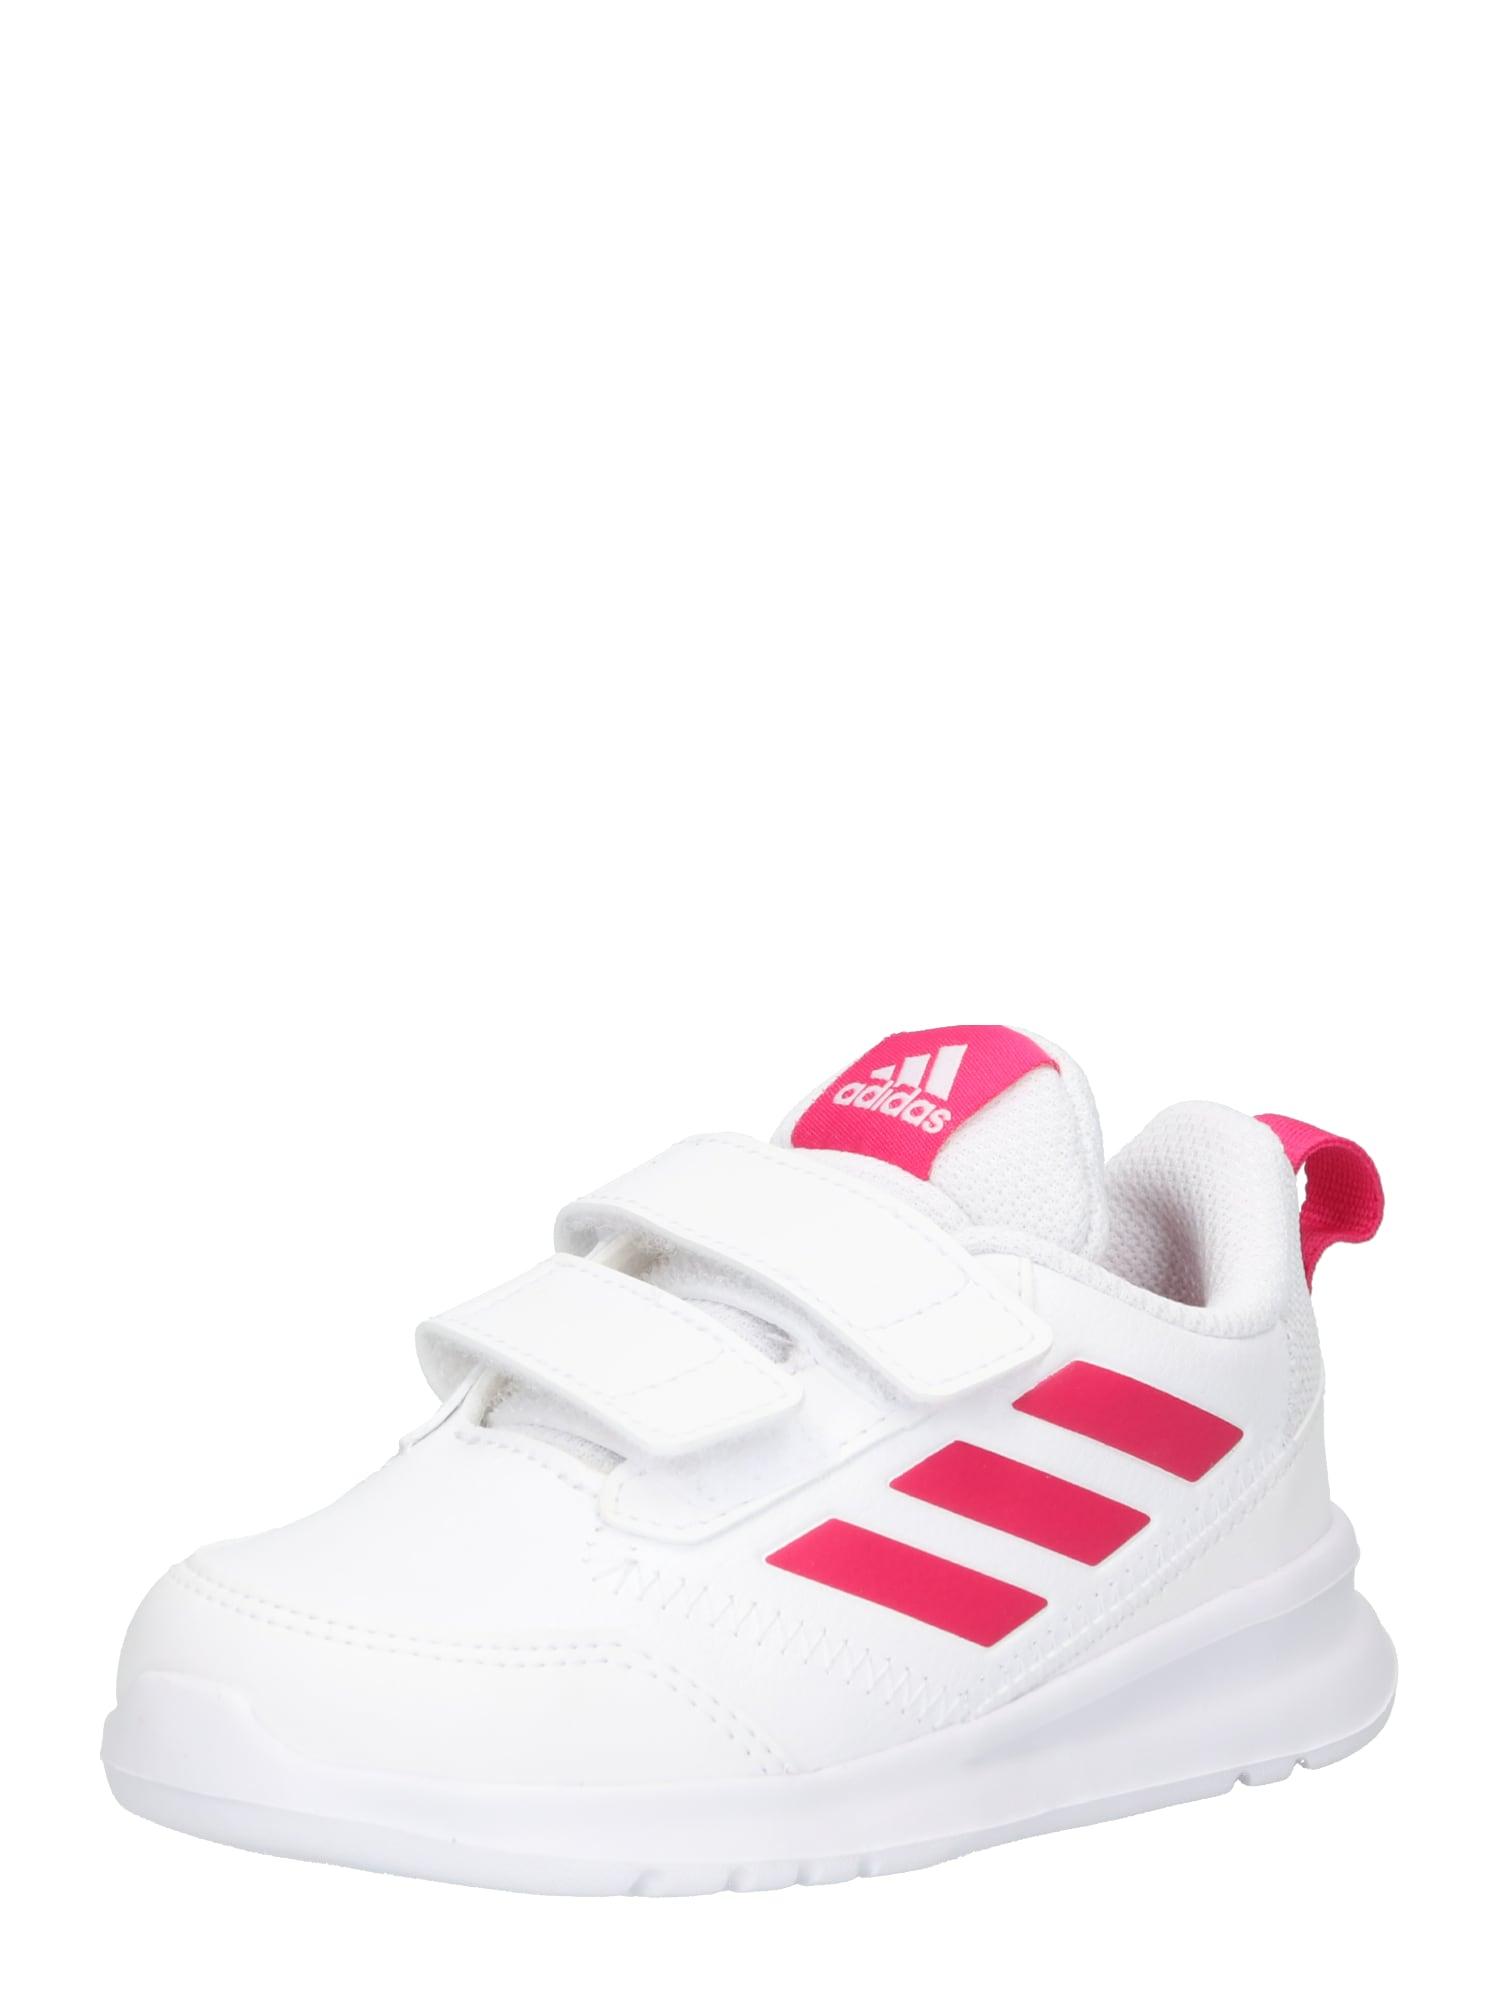 Sportovní boty AltaRun CF I pink bílá ADIDAS PERFORMANCE